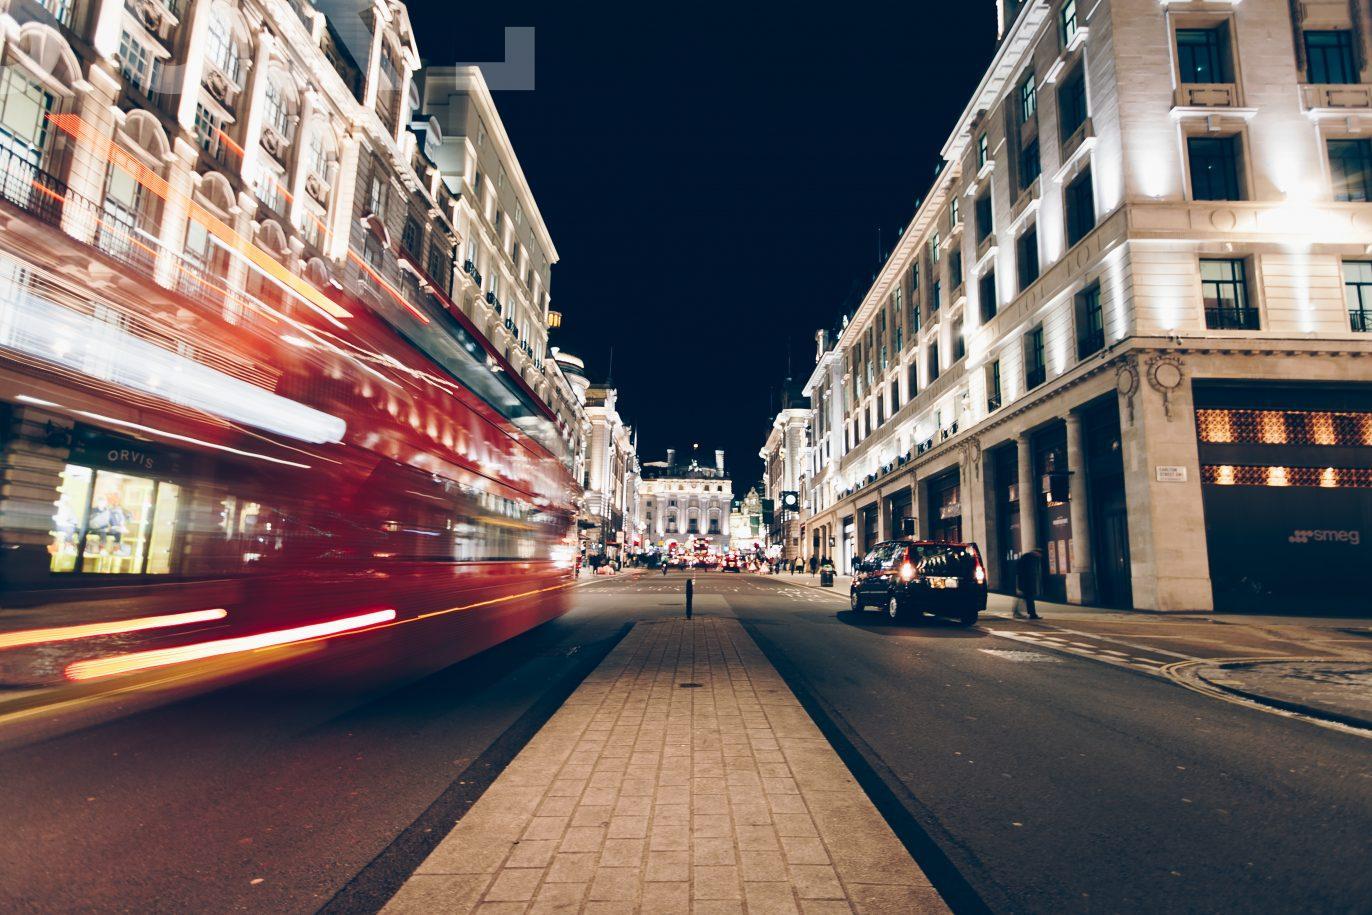 Oxford street by night